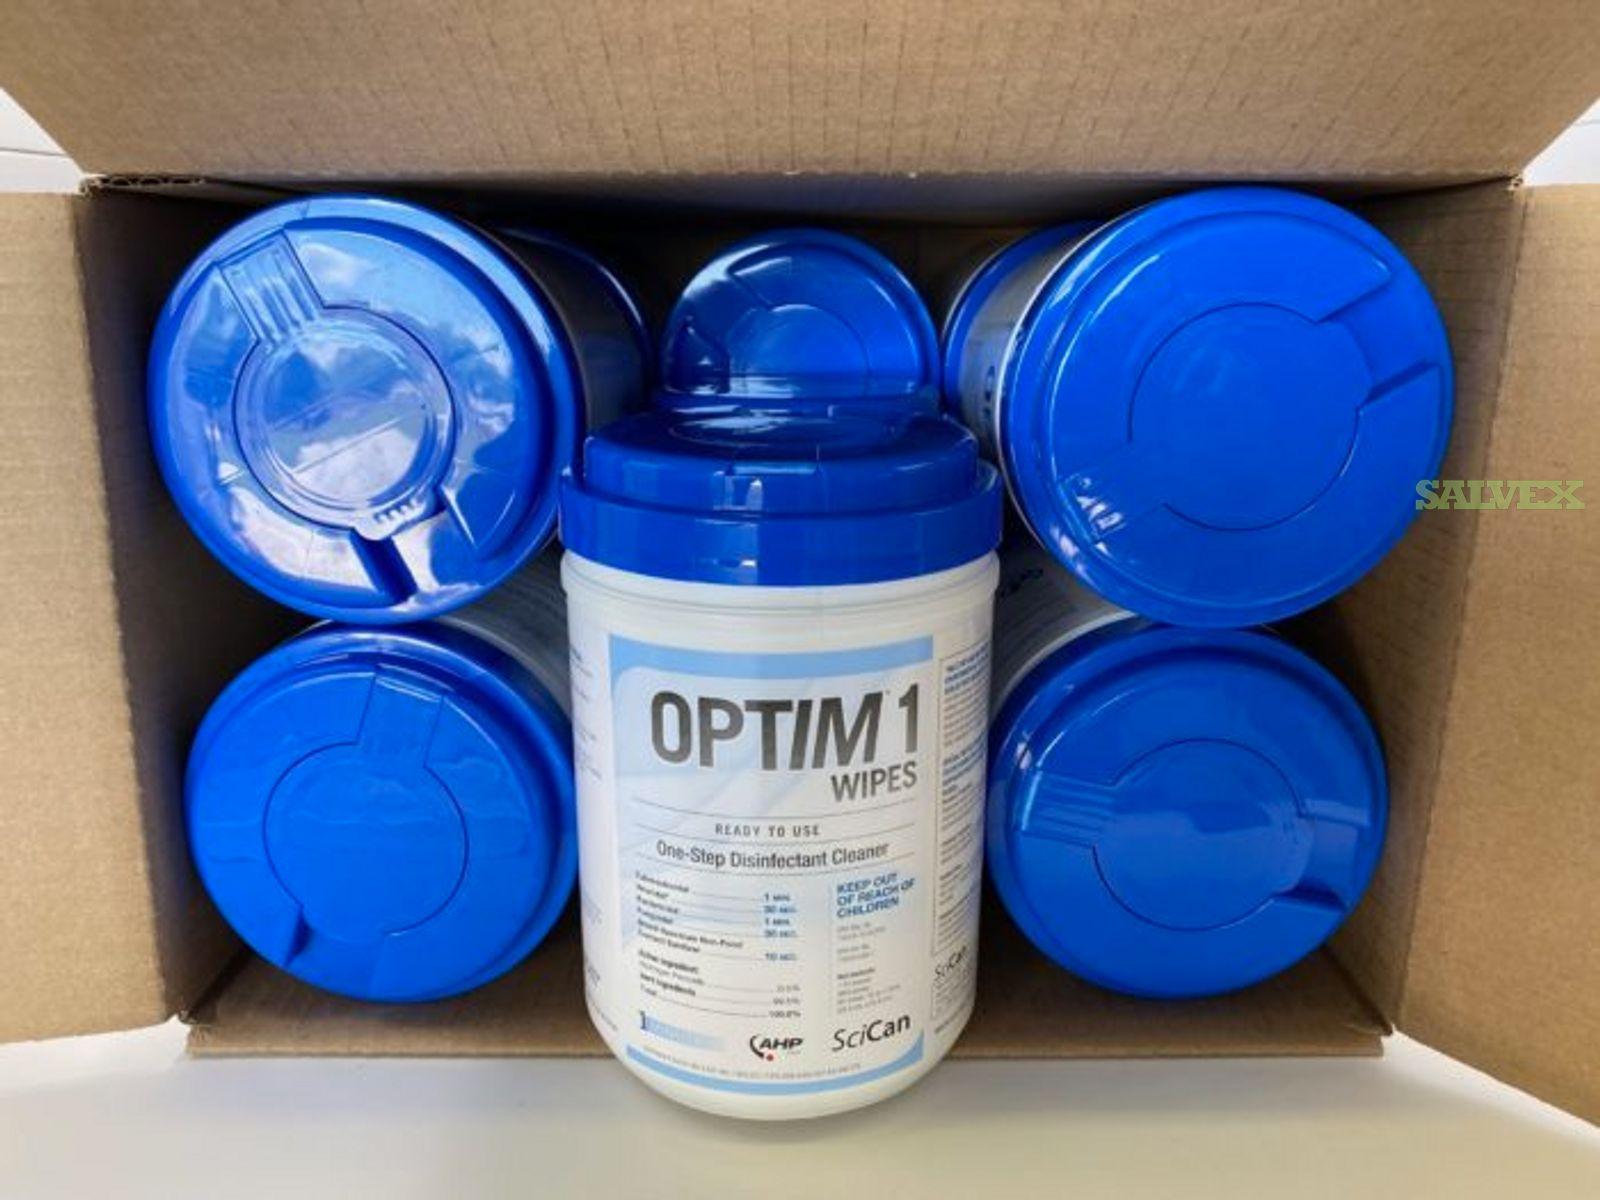 Optim1 RTU Wipes 6''x7'' OEM (400 Cases)